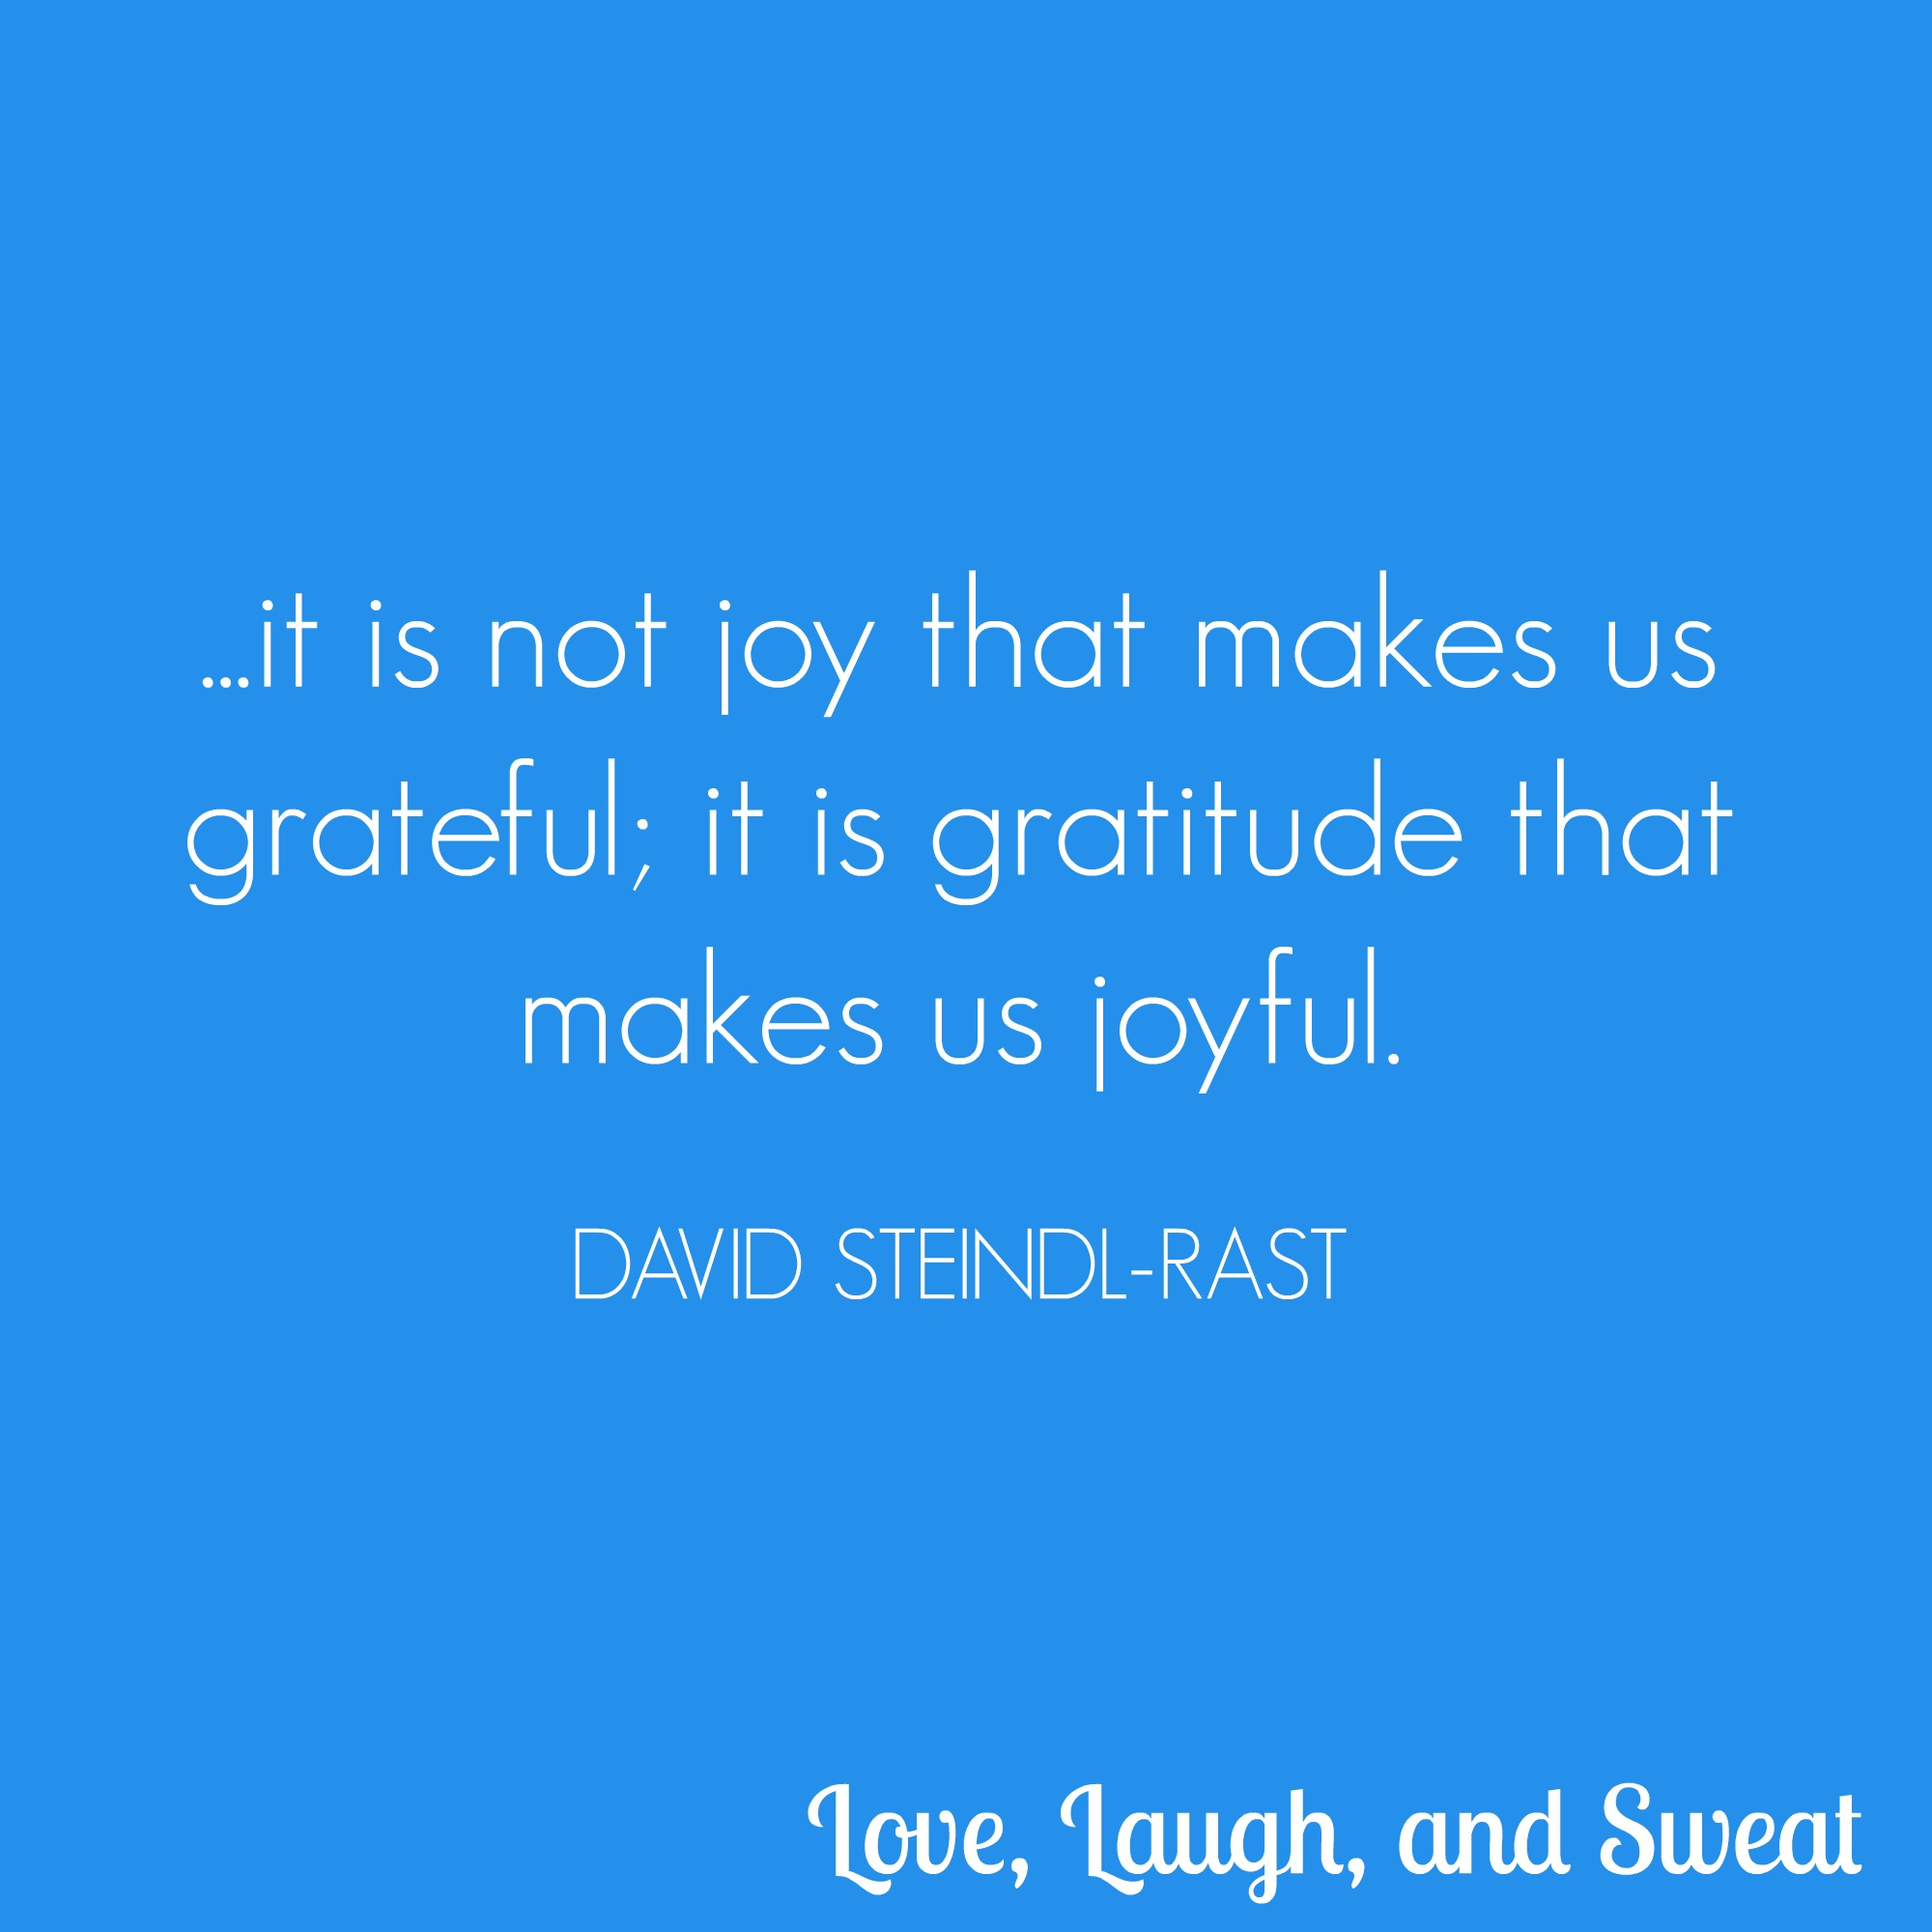 gratitude and joyful